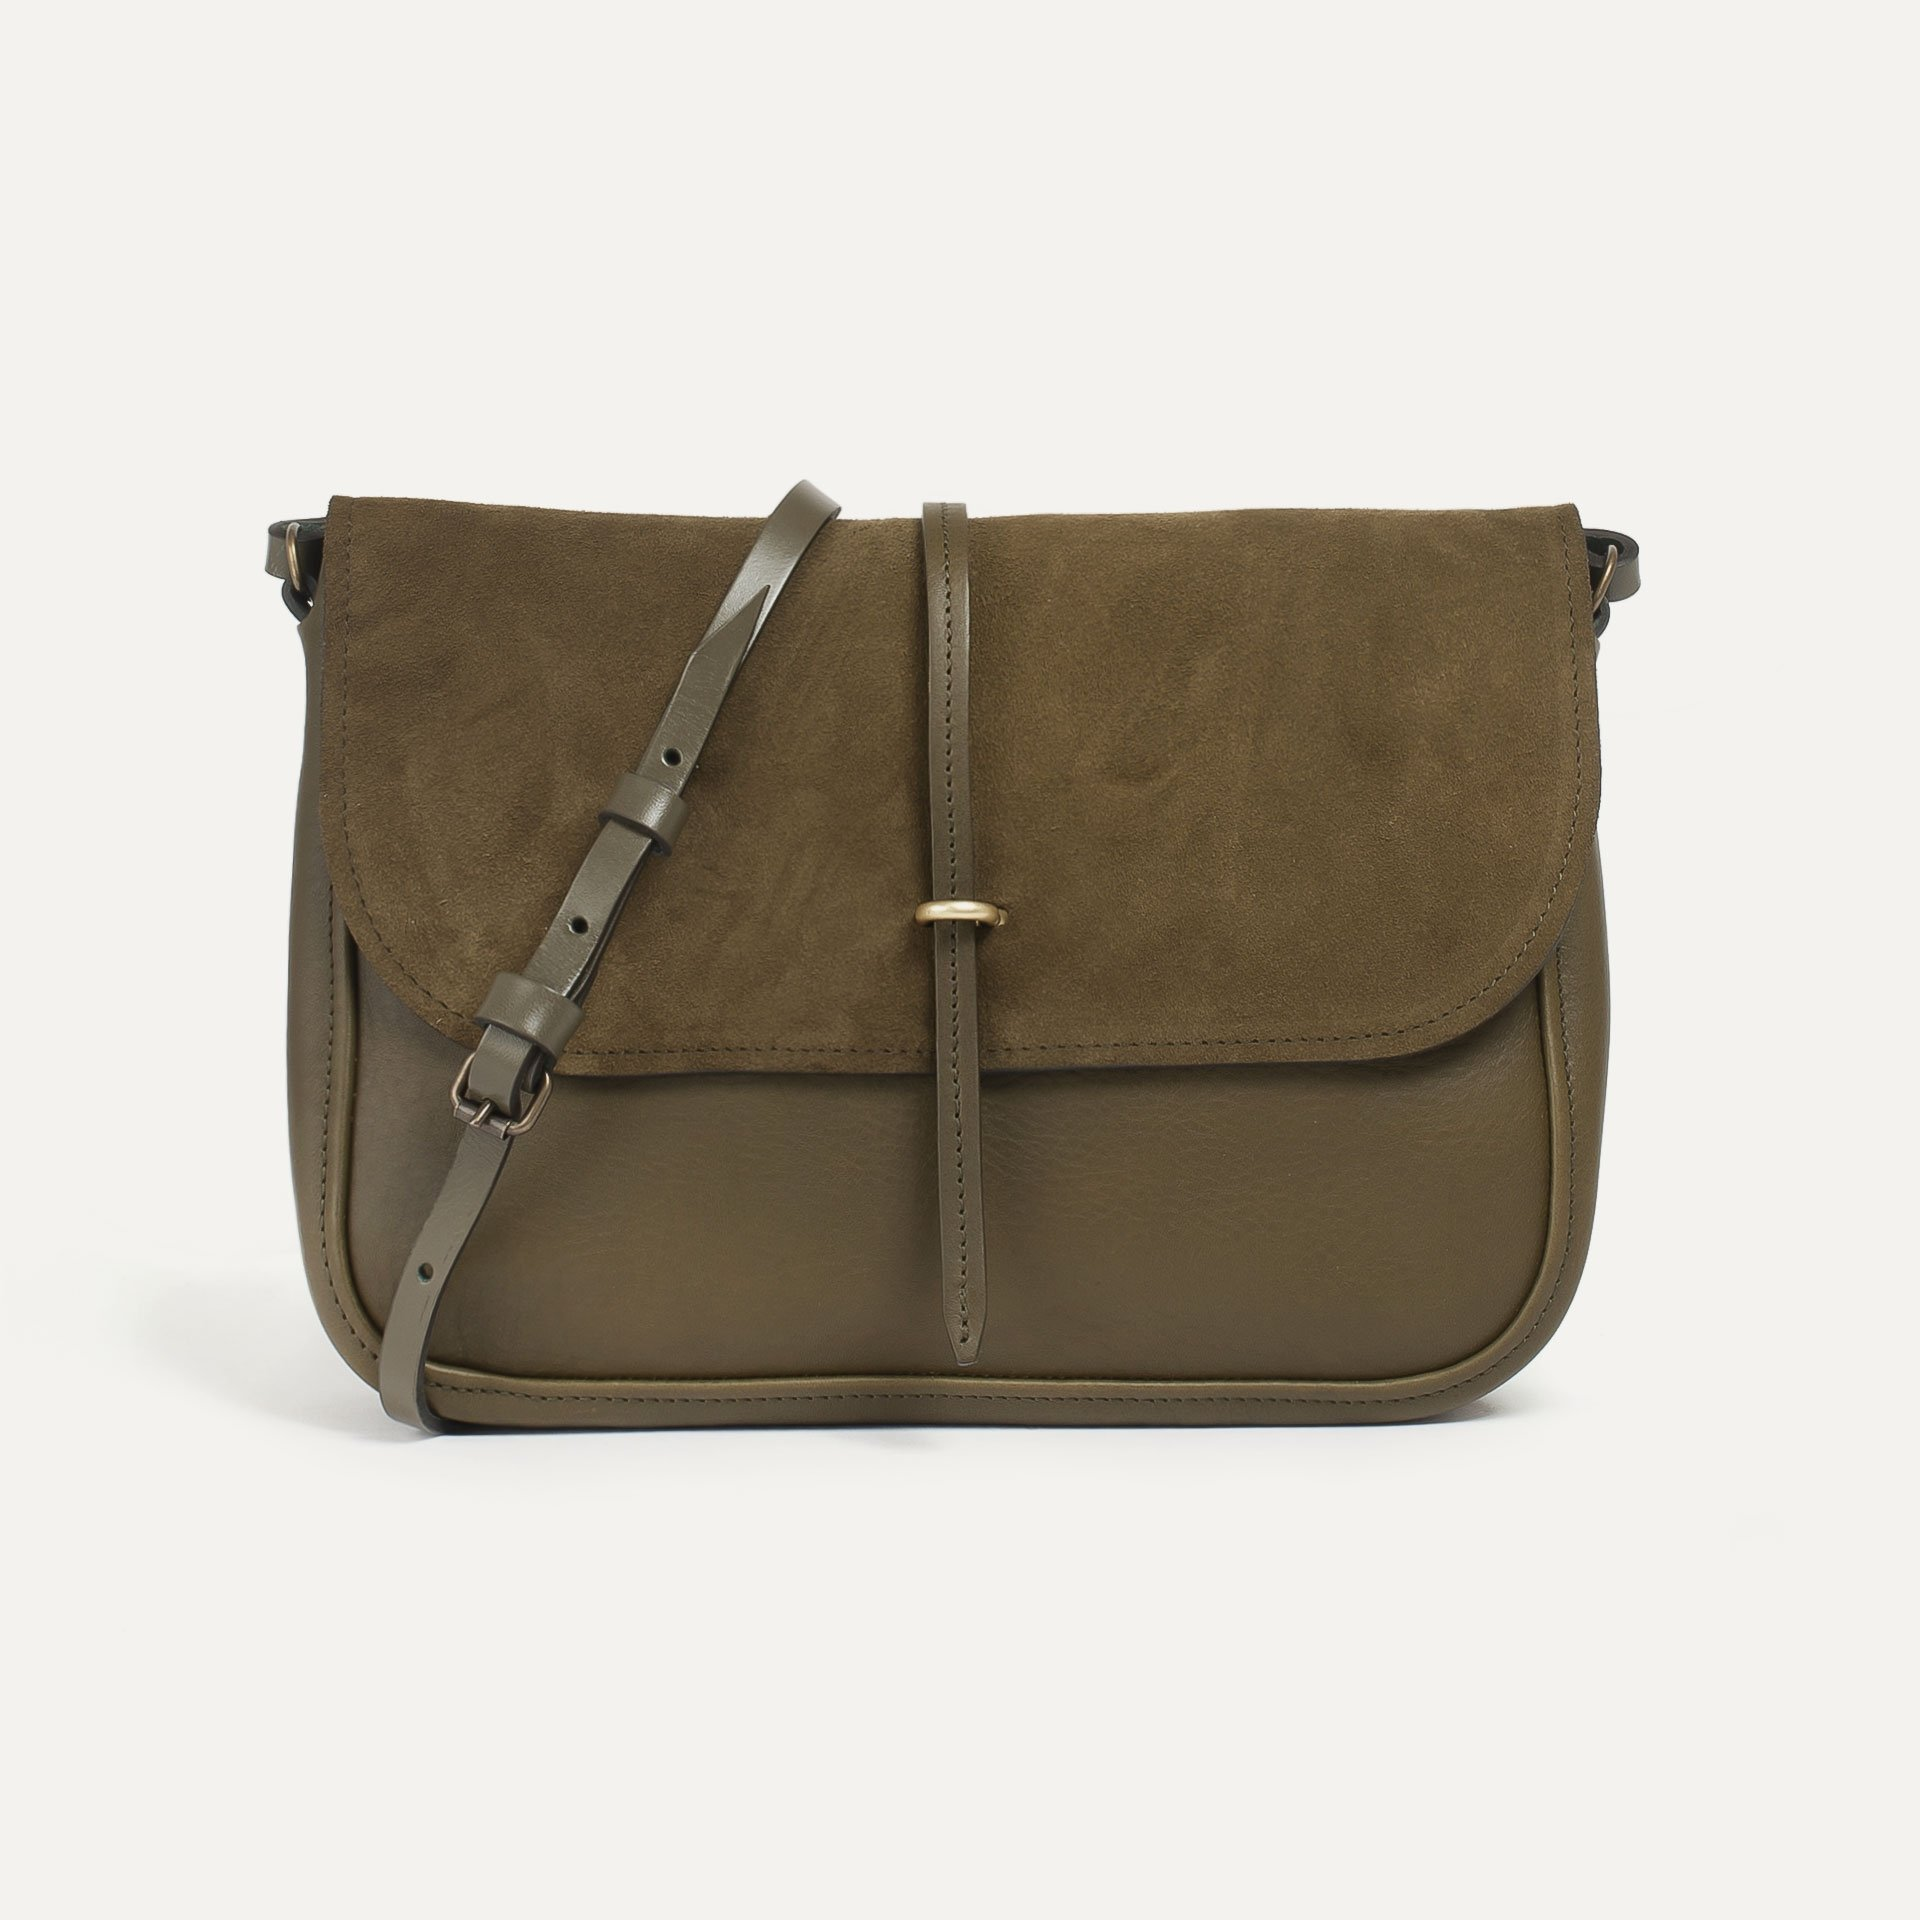 Pastel handbag - Khaki / Mix (image n°1)